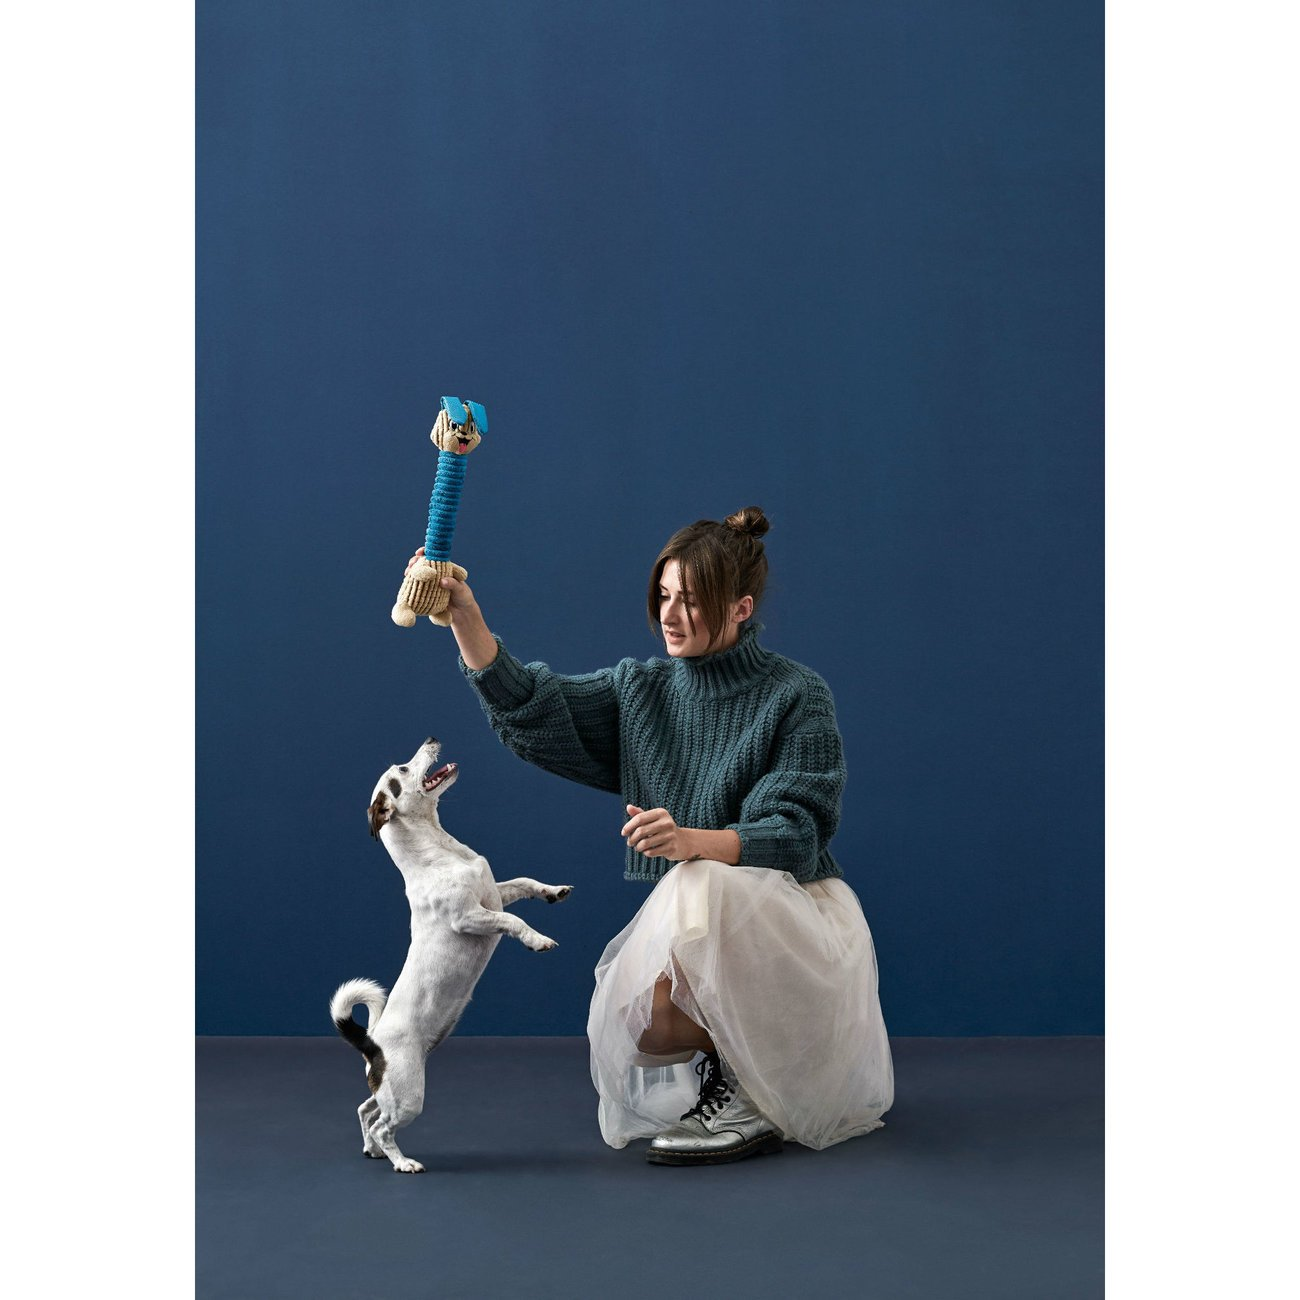 Hunter Hundespielzeug Granby 67452, Bild 4